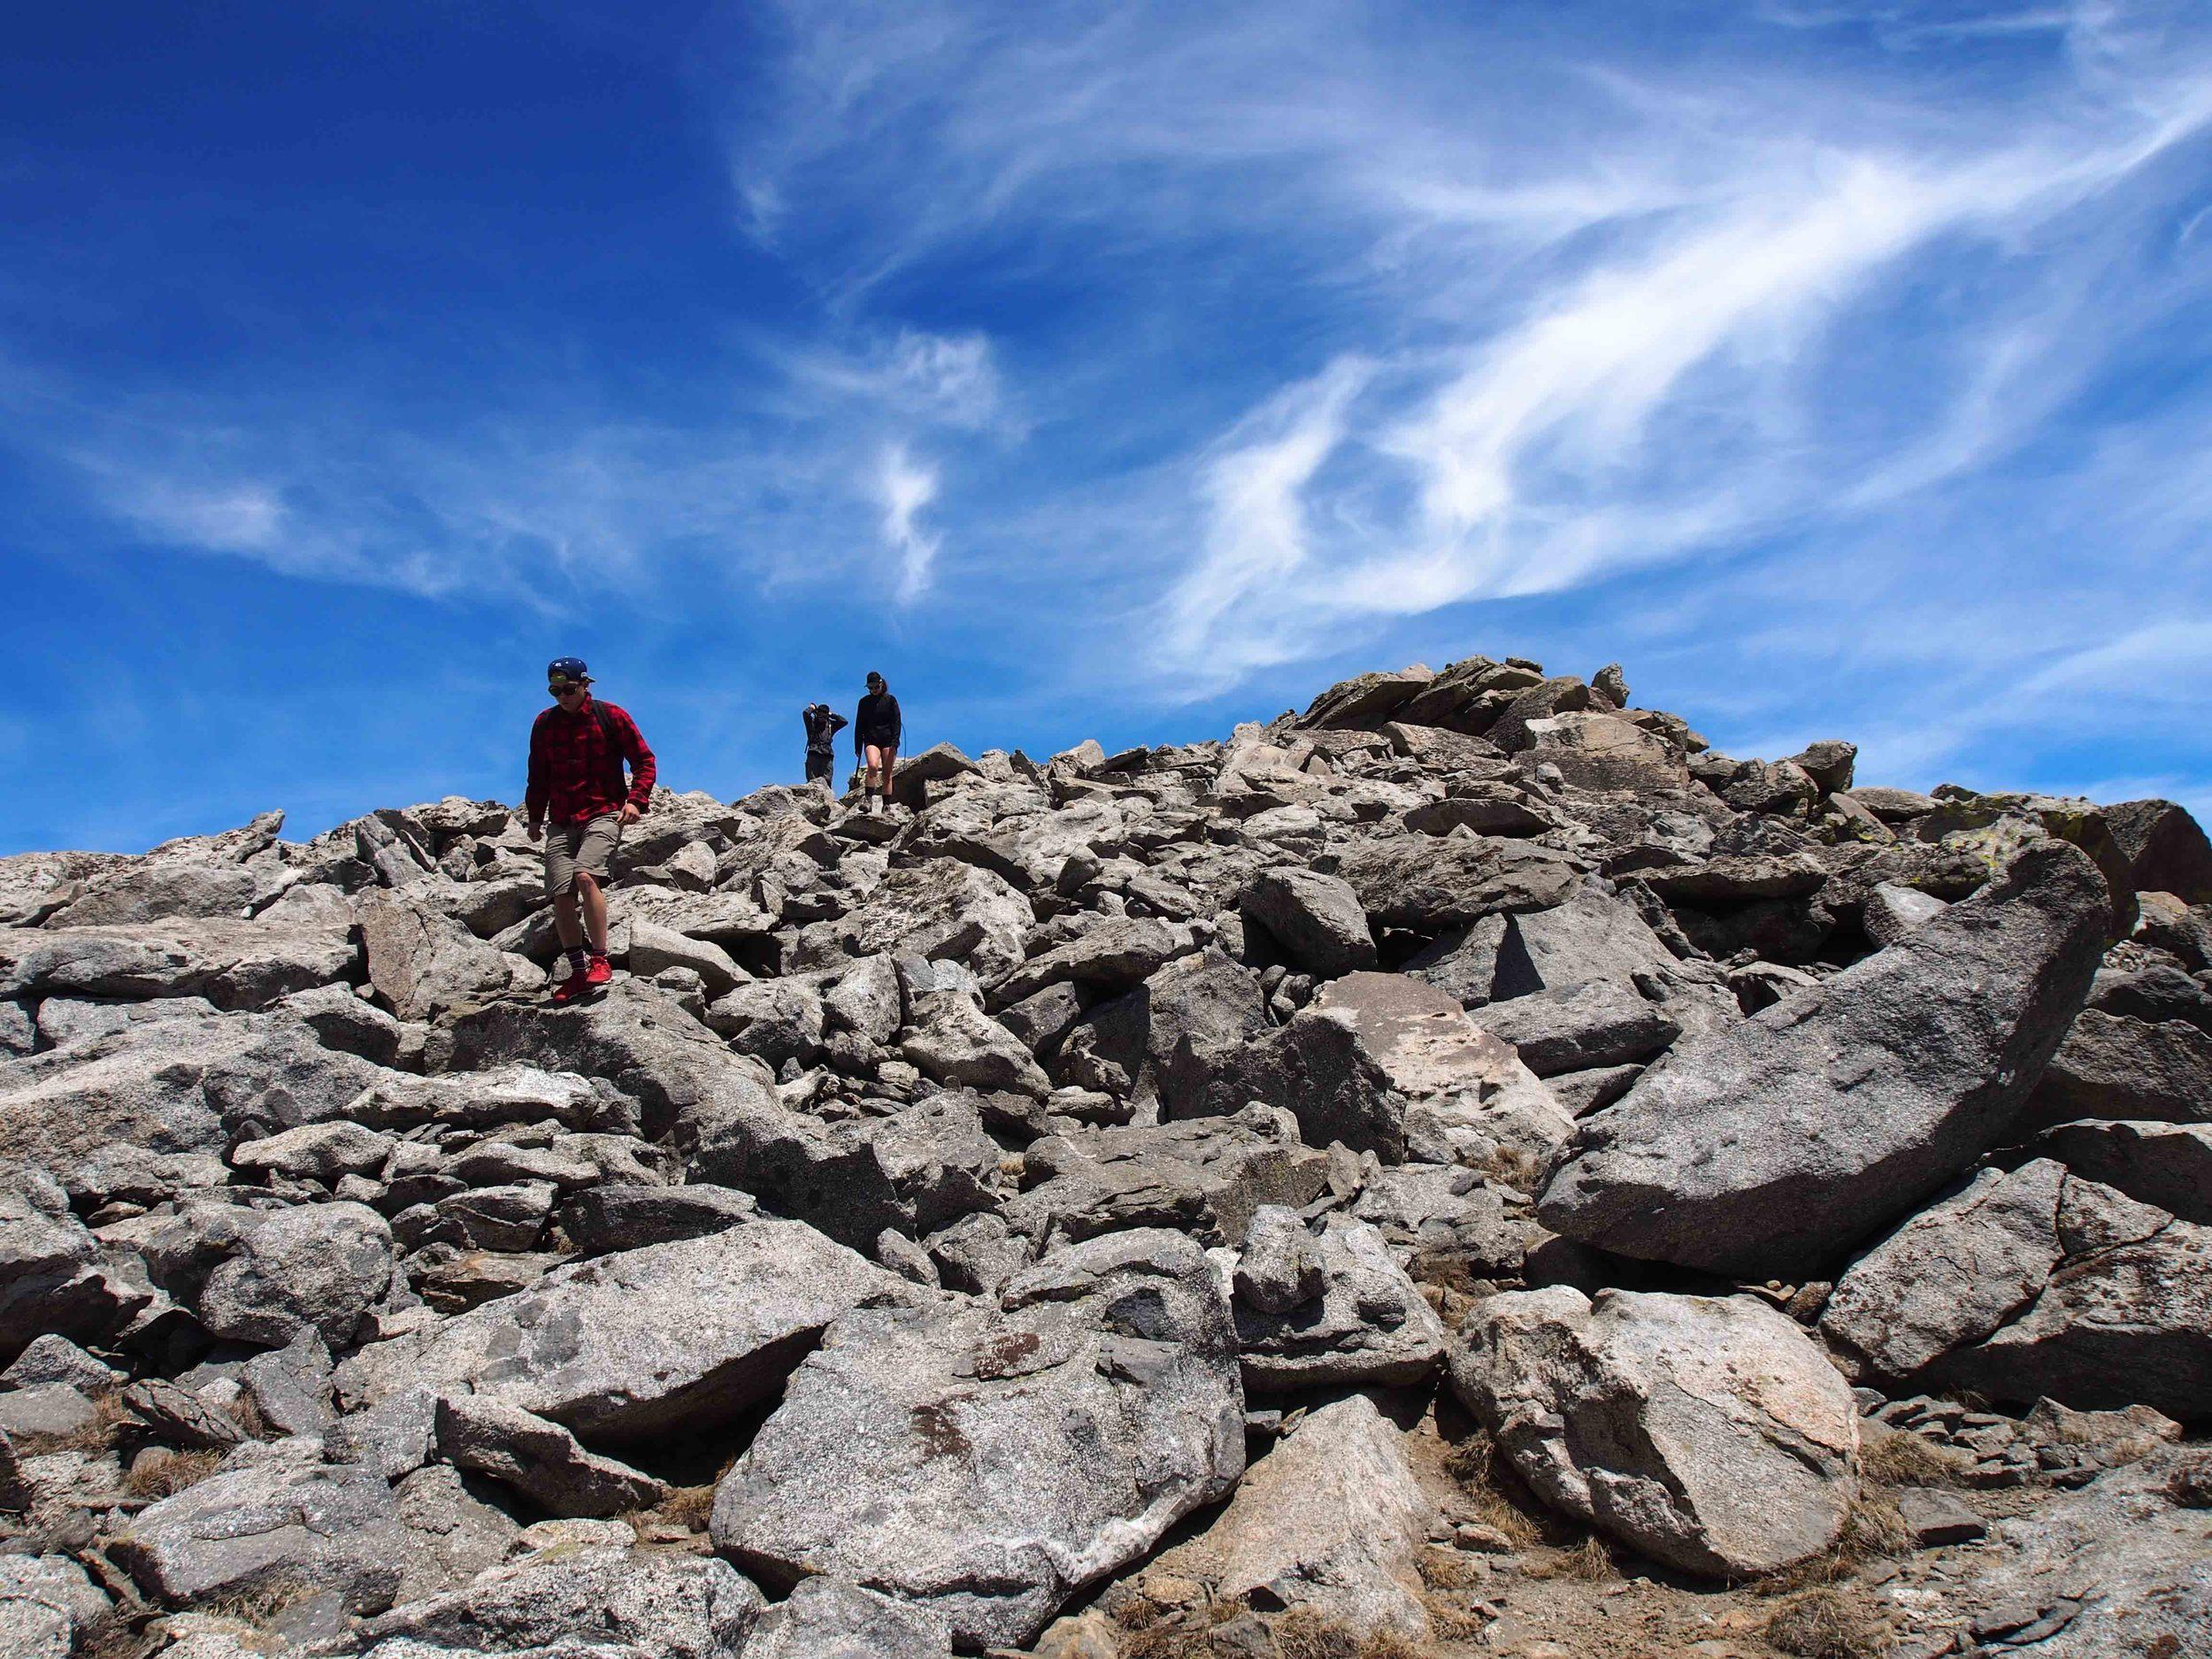 Hiking back down the boulder pile